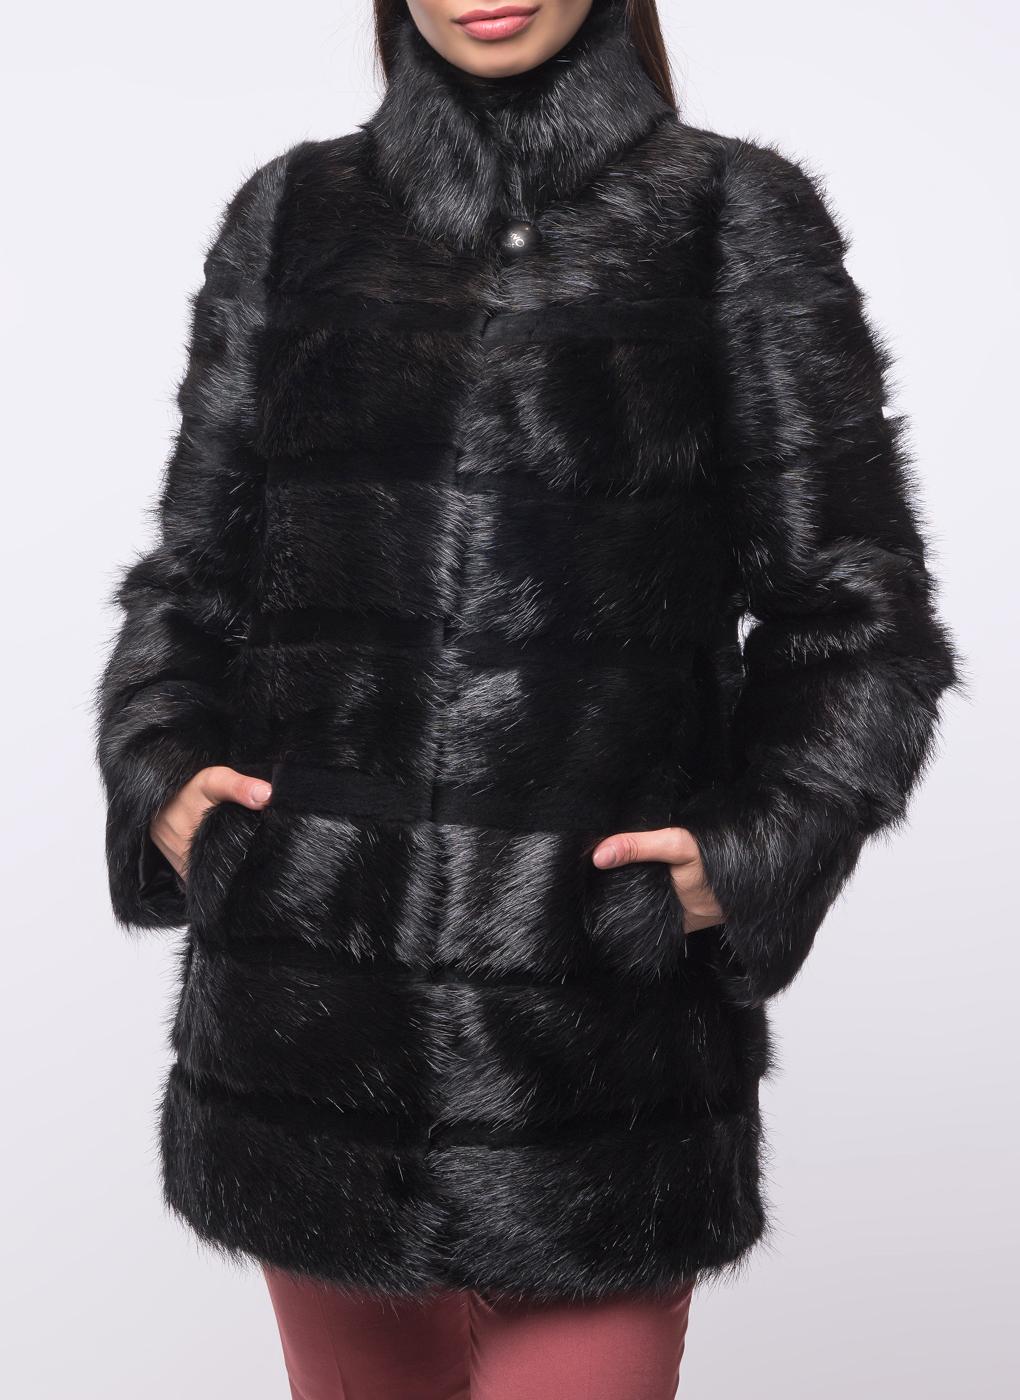 Куртка из нутрии Джульетта 1 02, Олимп фото